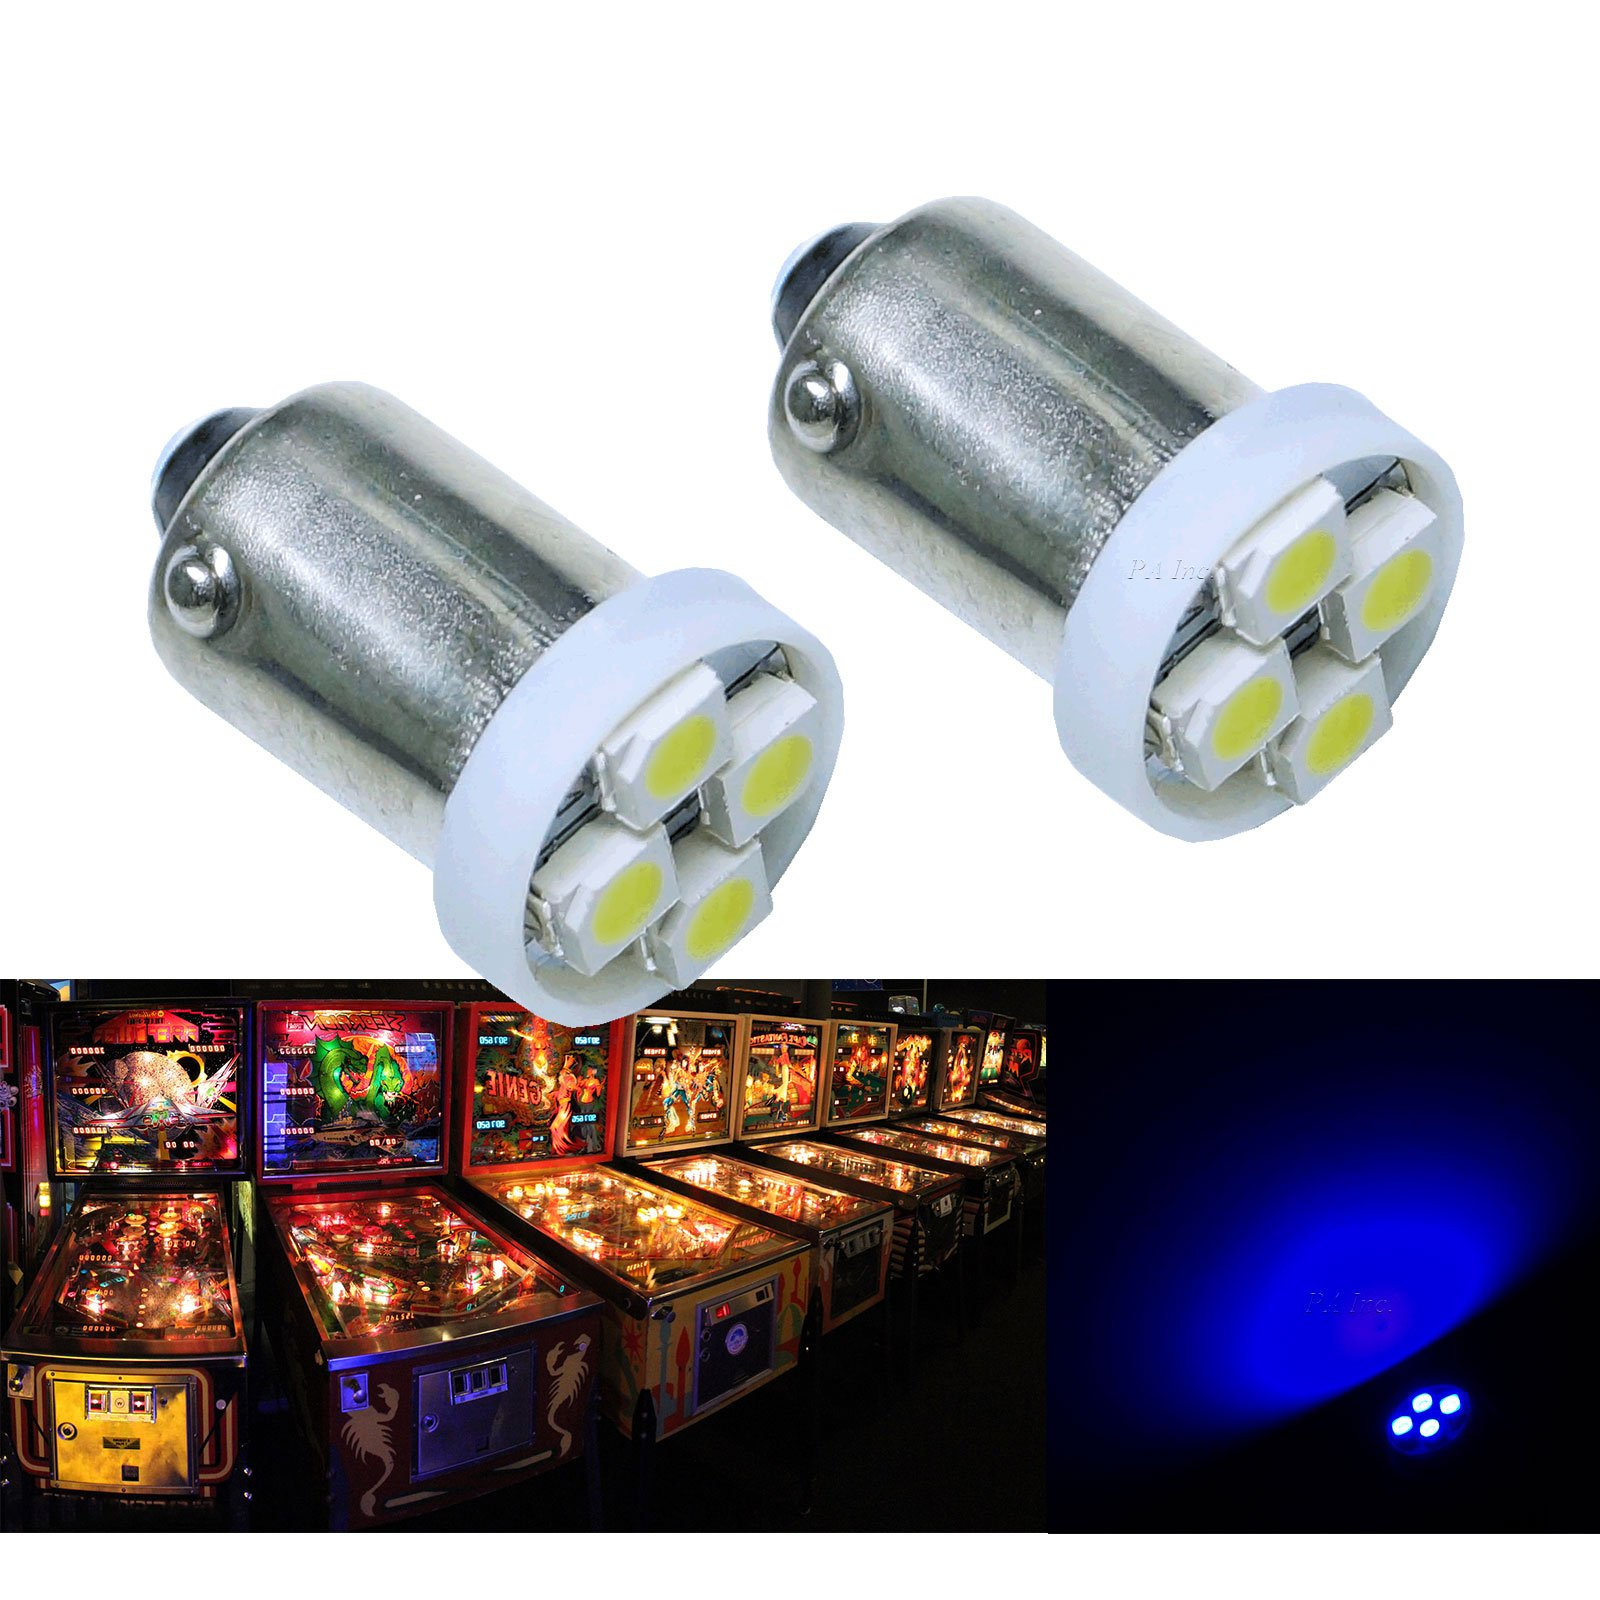 PA® 10PCS #1893 #44 #47 #756 #1847 BA9S 4SMD LED Wedge Pinball Machine Light Bulb Blue-6.3V by Per-Accurate Inc.